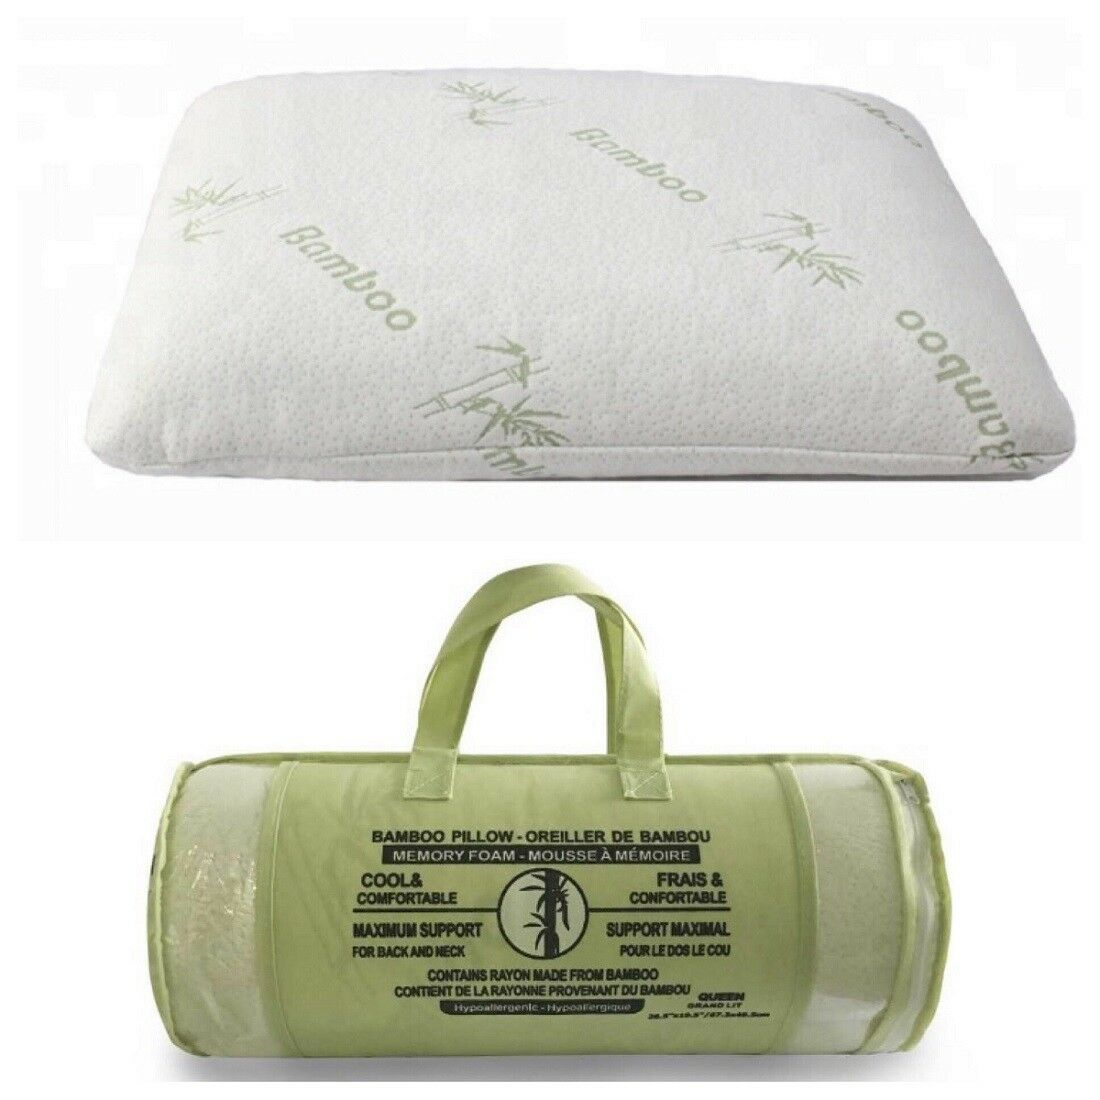 Memory Foam Bamboo Pillow Hypoallergenic 2 Pieces Queen & King Adjustable Fill